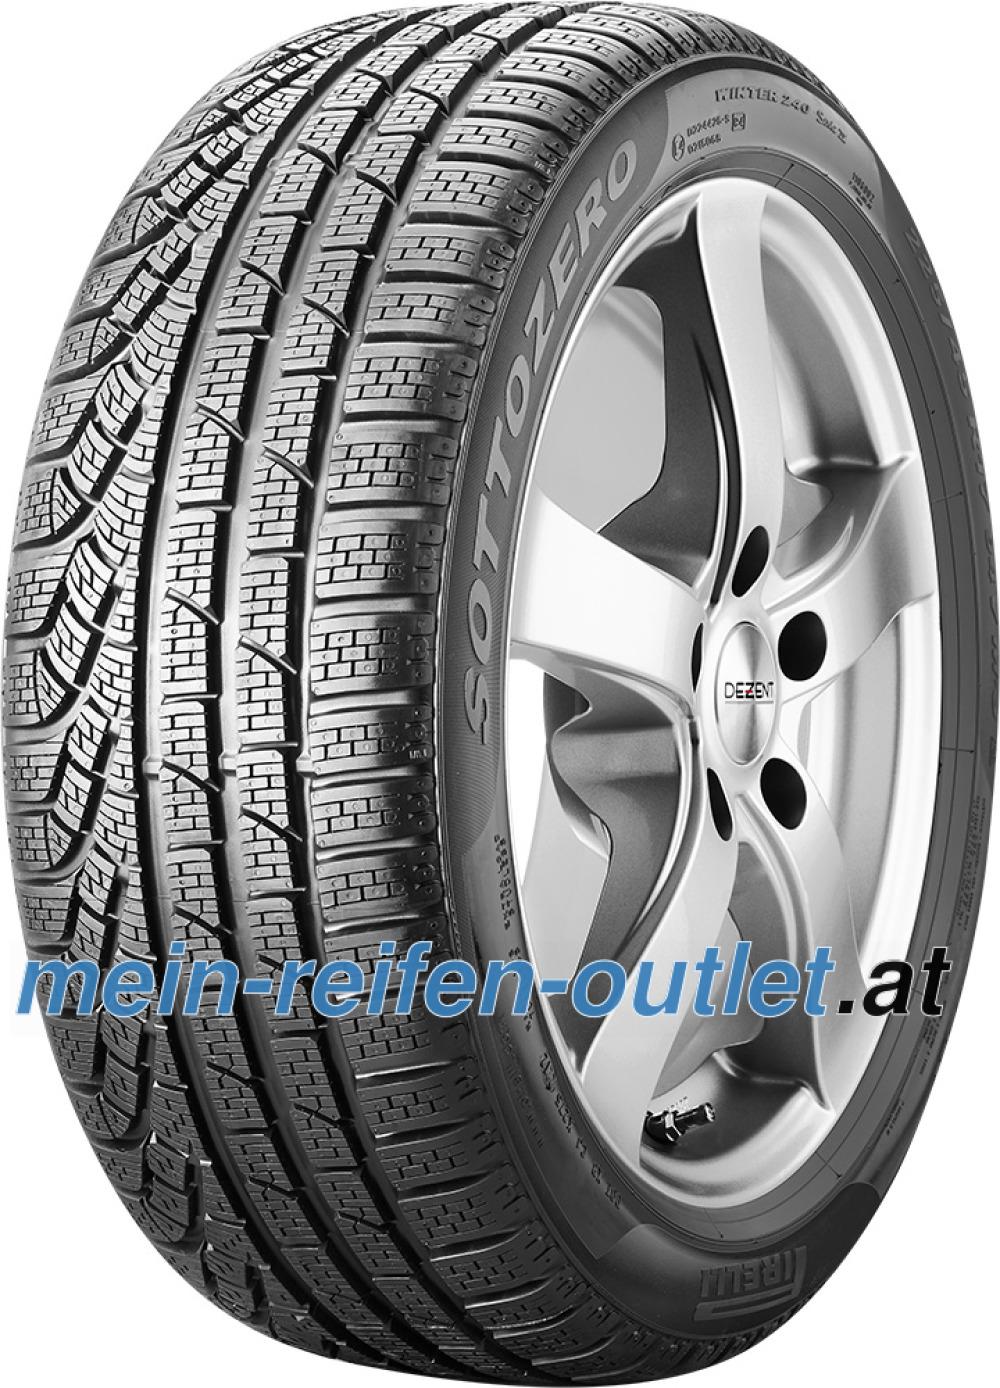 Pirelli W 240 SottoZero S2 ( 265/35 R20 99V XL , mit Felgenschutz (MFS) )